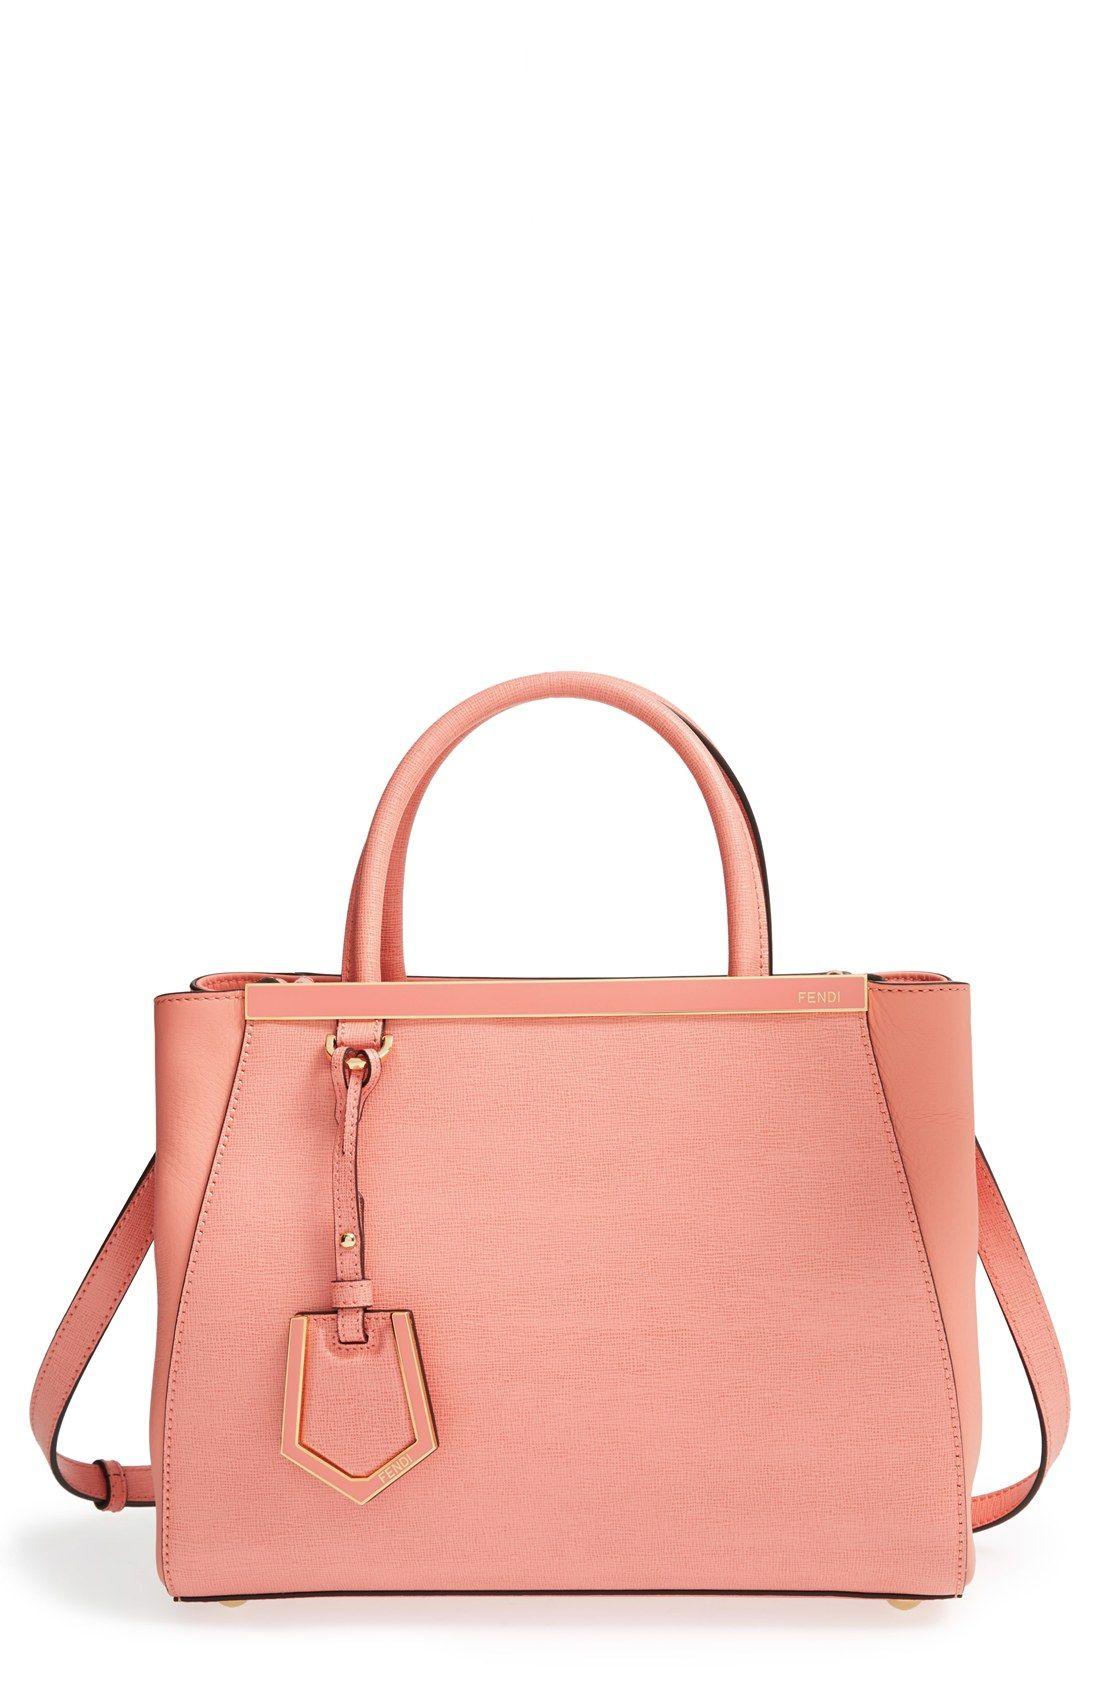 18b8cdbf1a This peach Fendi leather shopper is on the wish list.